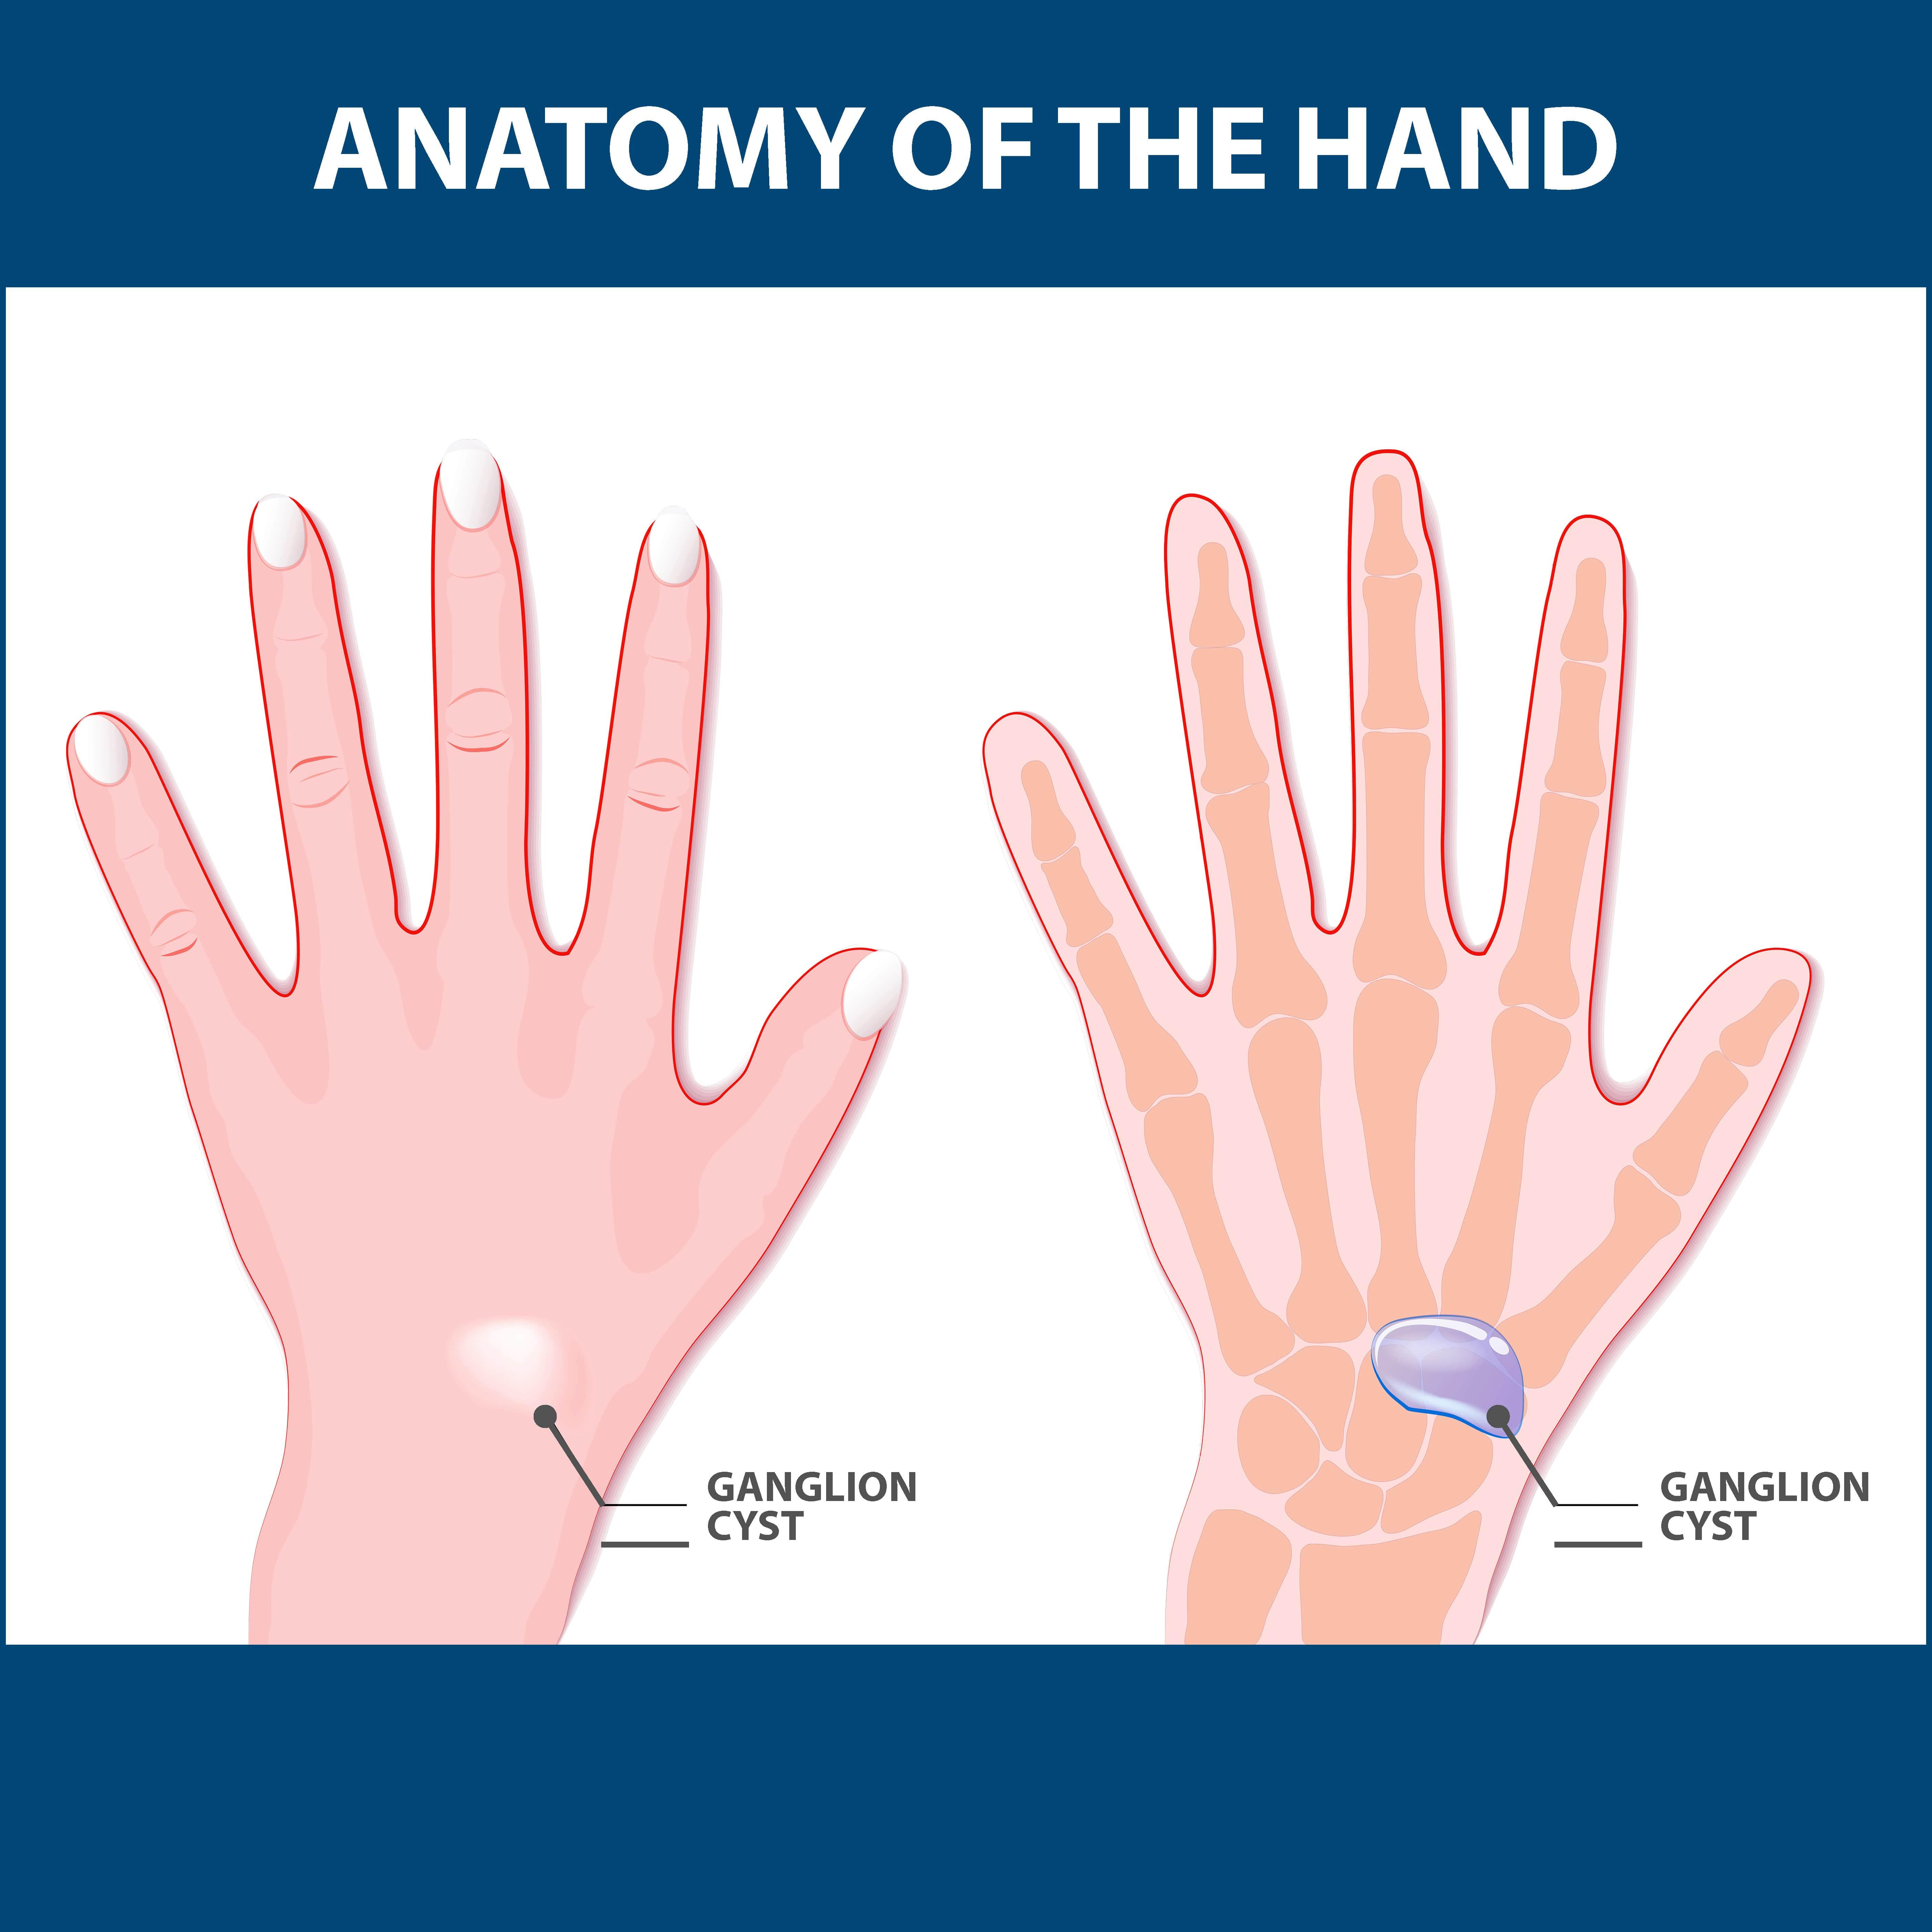 ganglion cysts anatomy graphic